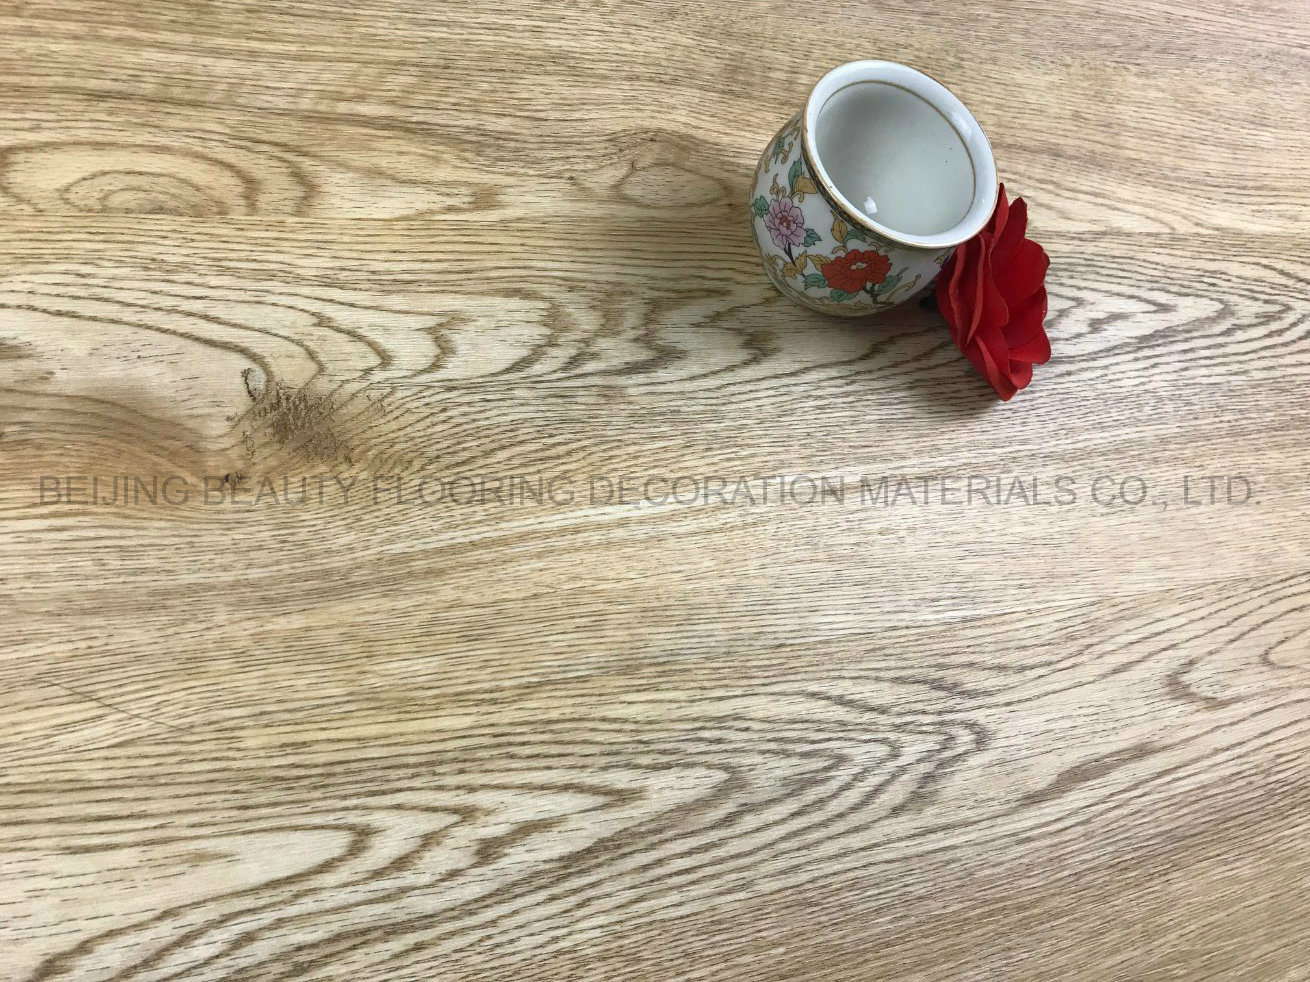 China Waterproof Scratch Proof Fireproof PVC Vinyl Flooring for Ce